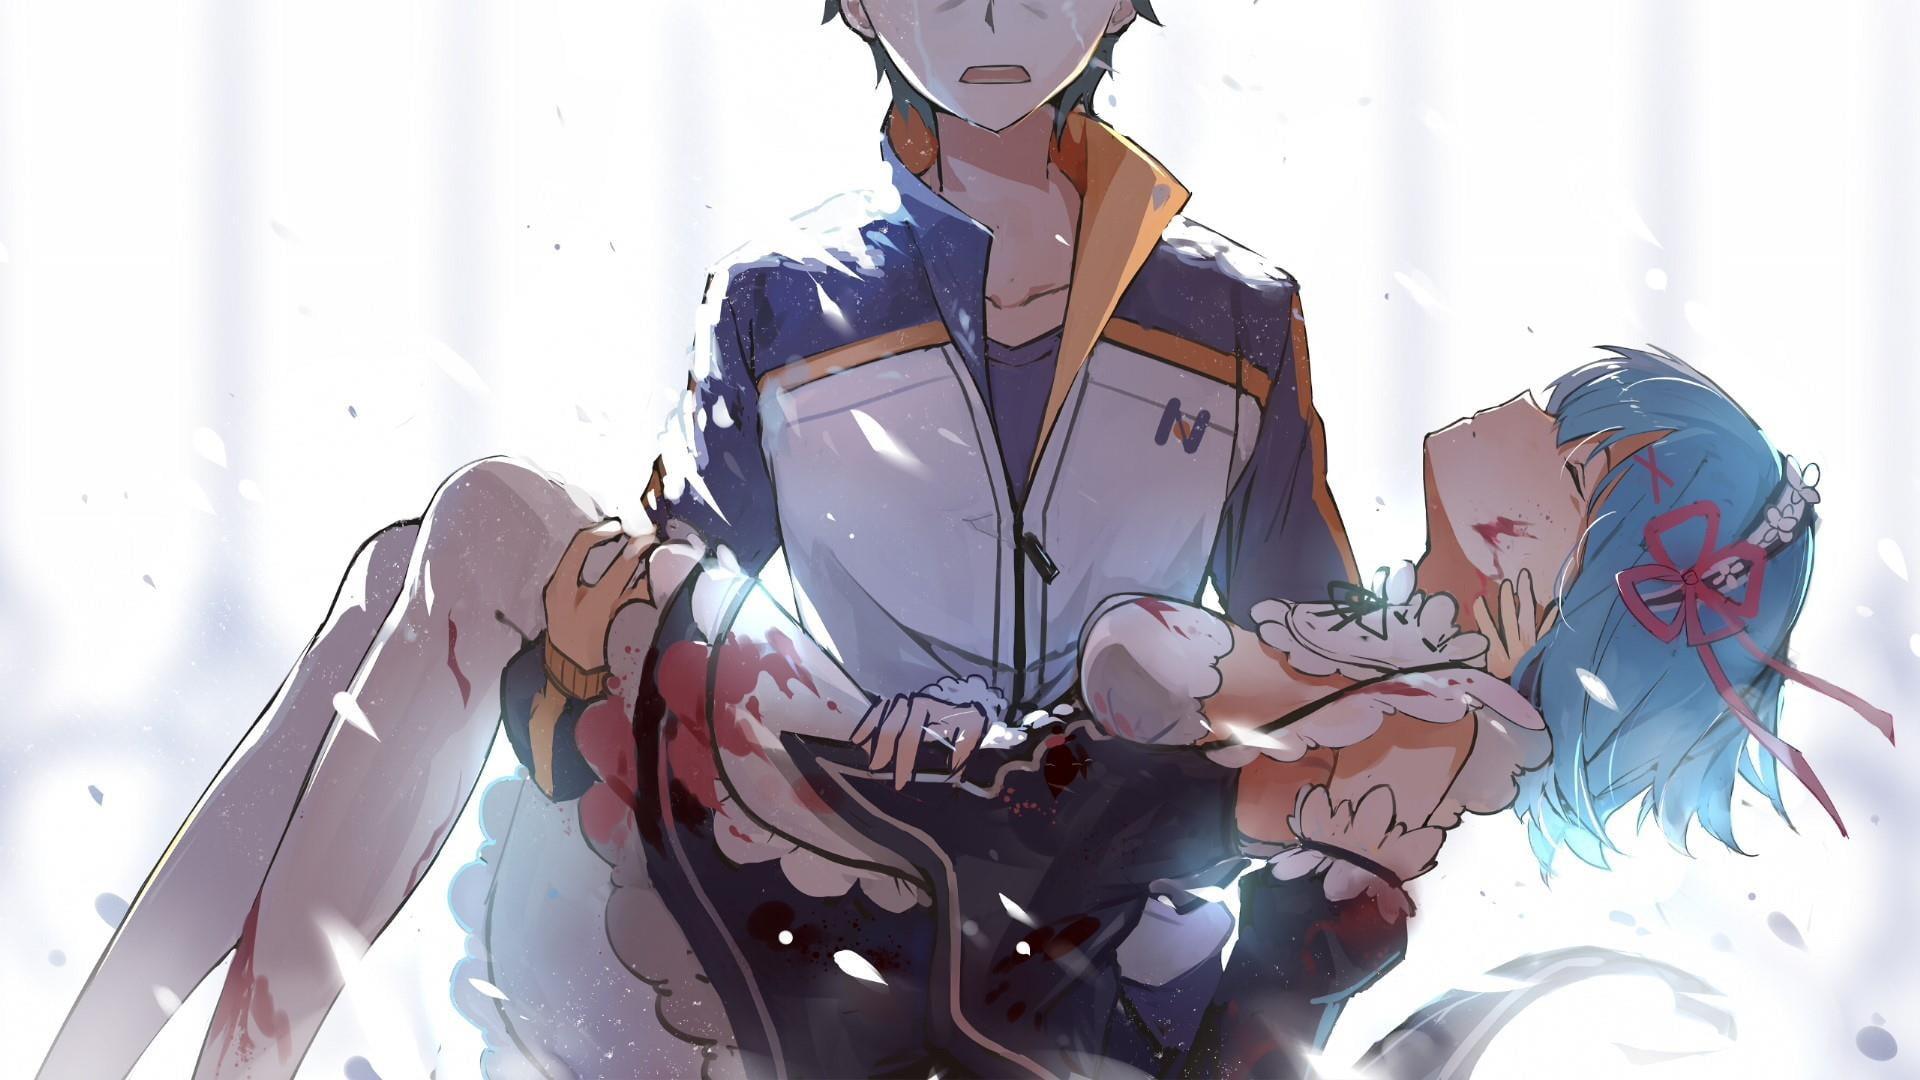 Res: 1920x1080, rem, subaru, rezero, sad, anime, otaku